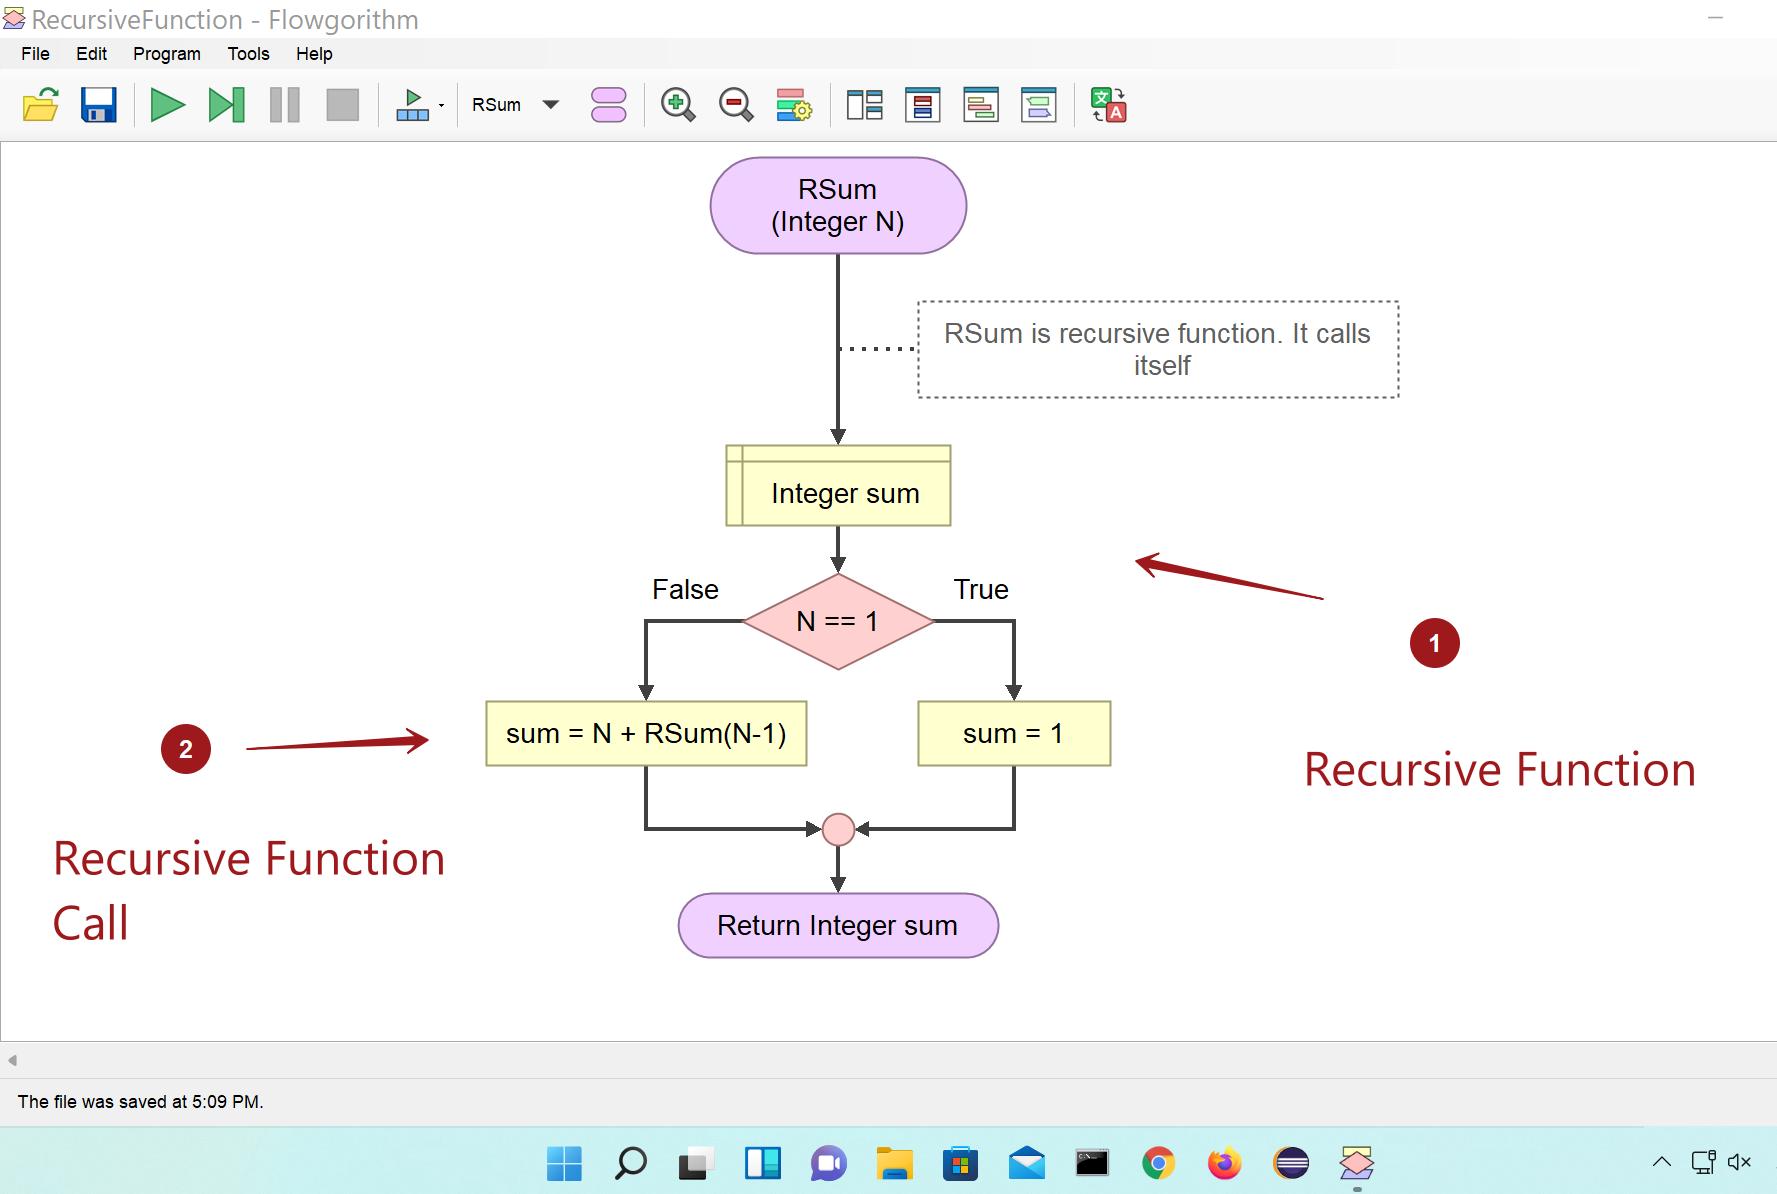 Recursive Function Call